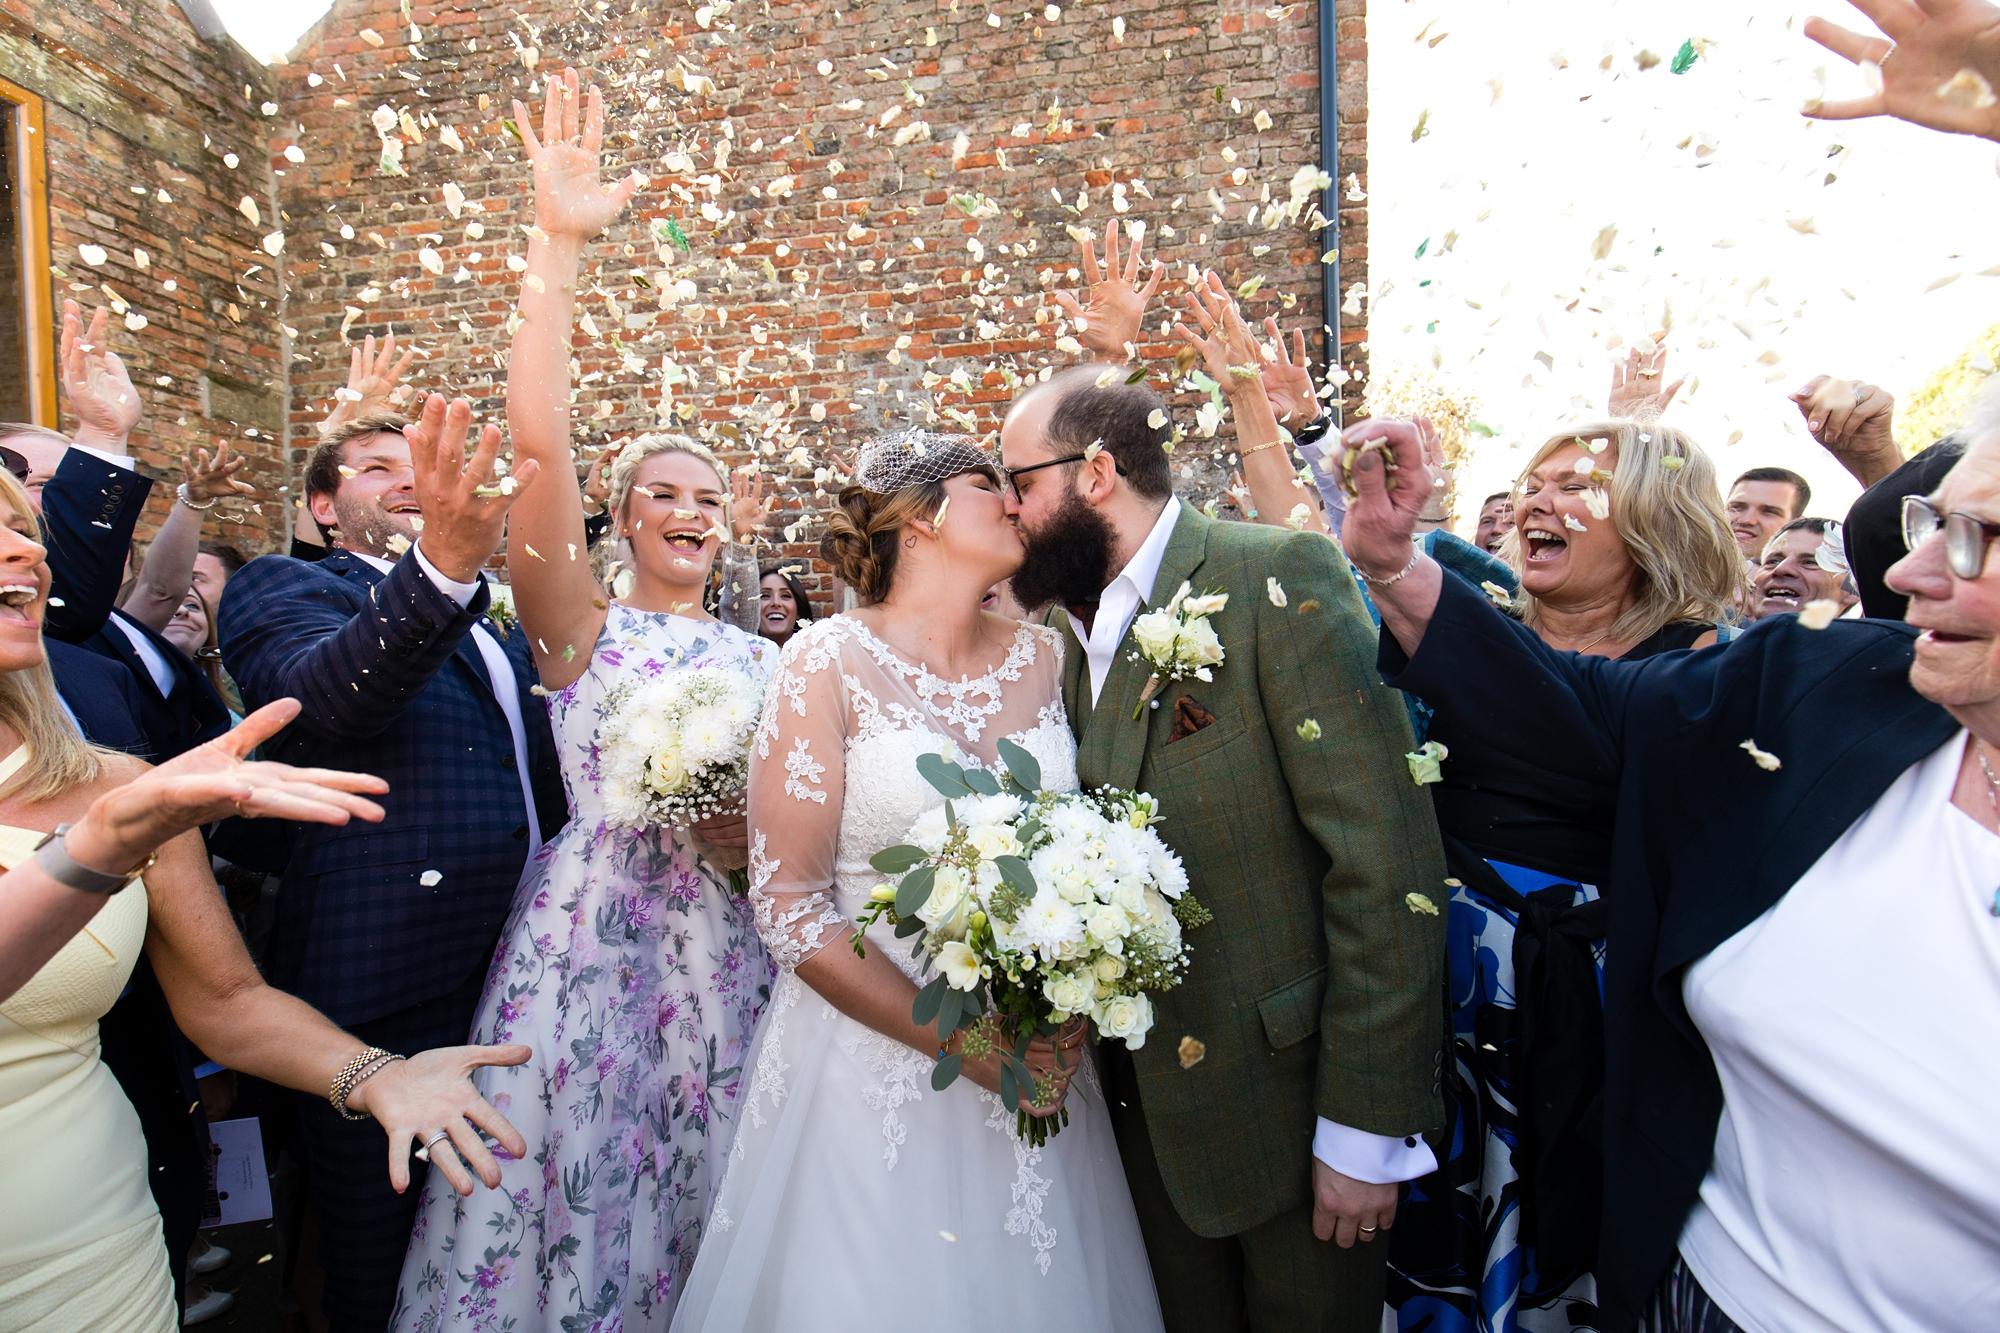 York Wedding Photography at Barmbyfield Barns confetti